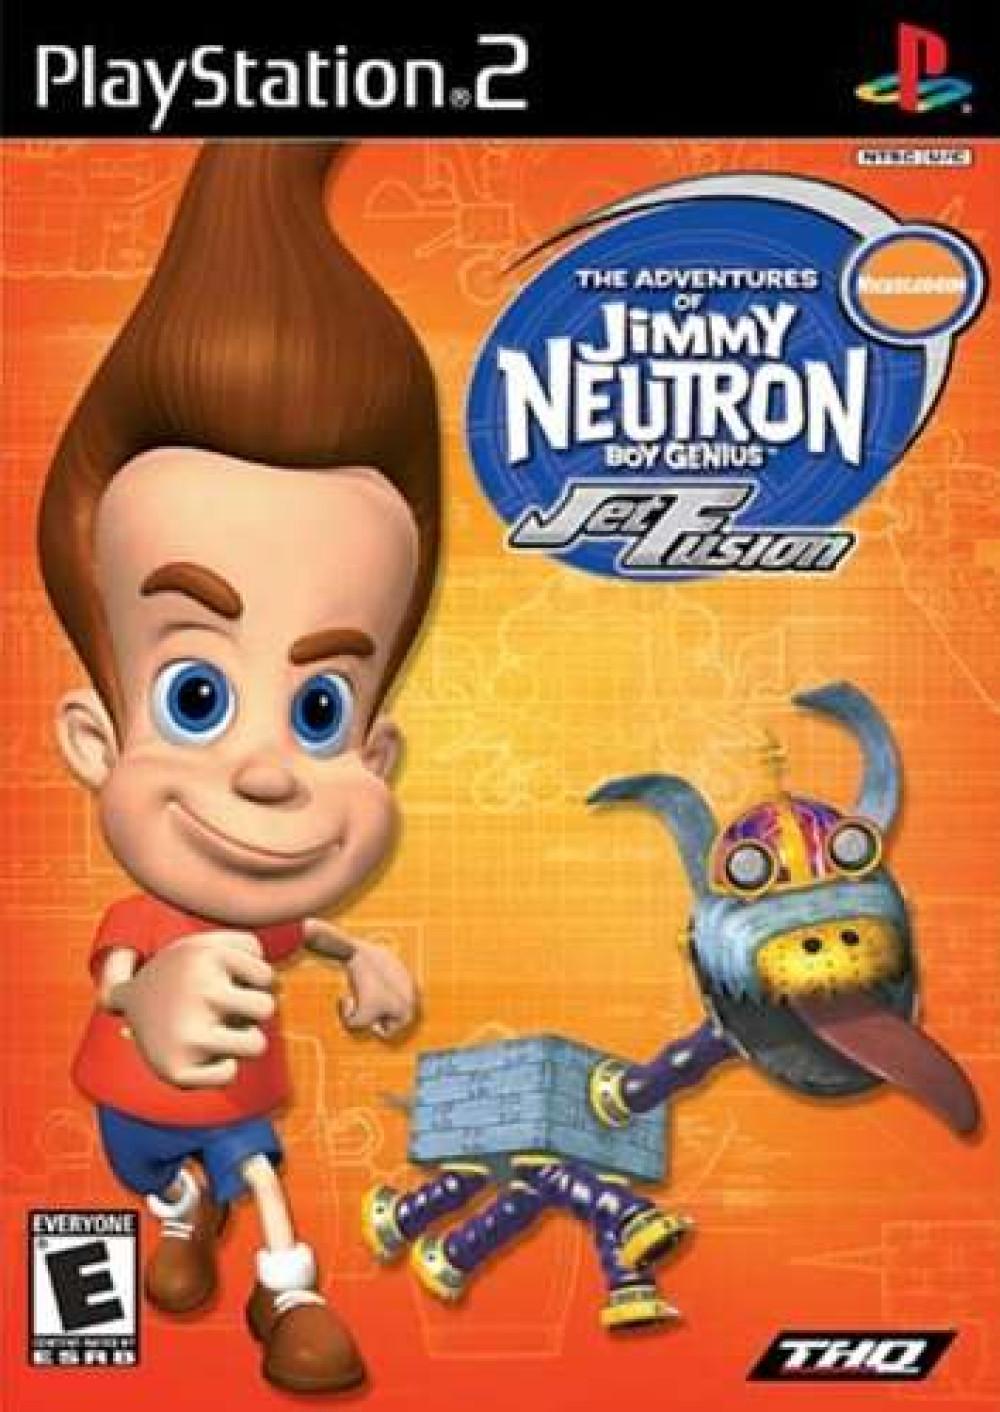 The Adventures of Jimmy Neutron Boy Genius Jet Fusion PS2